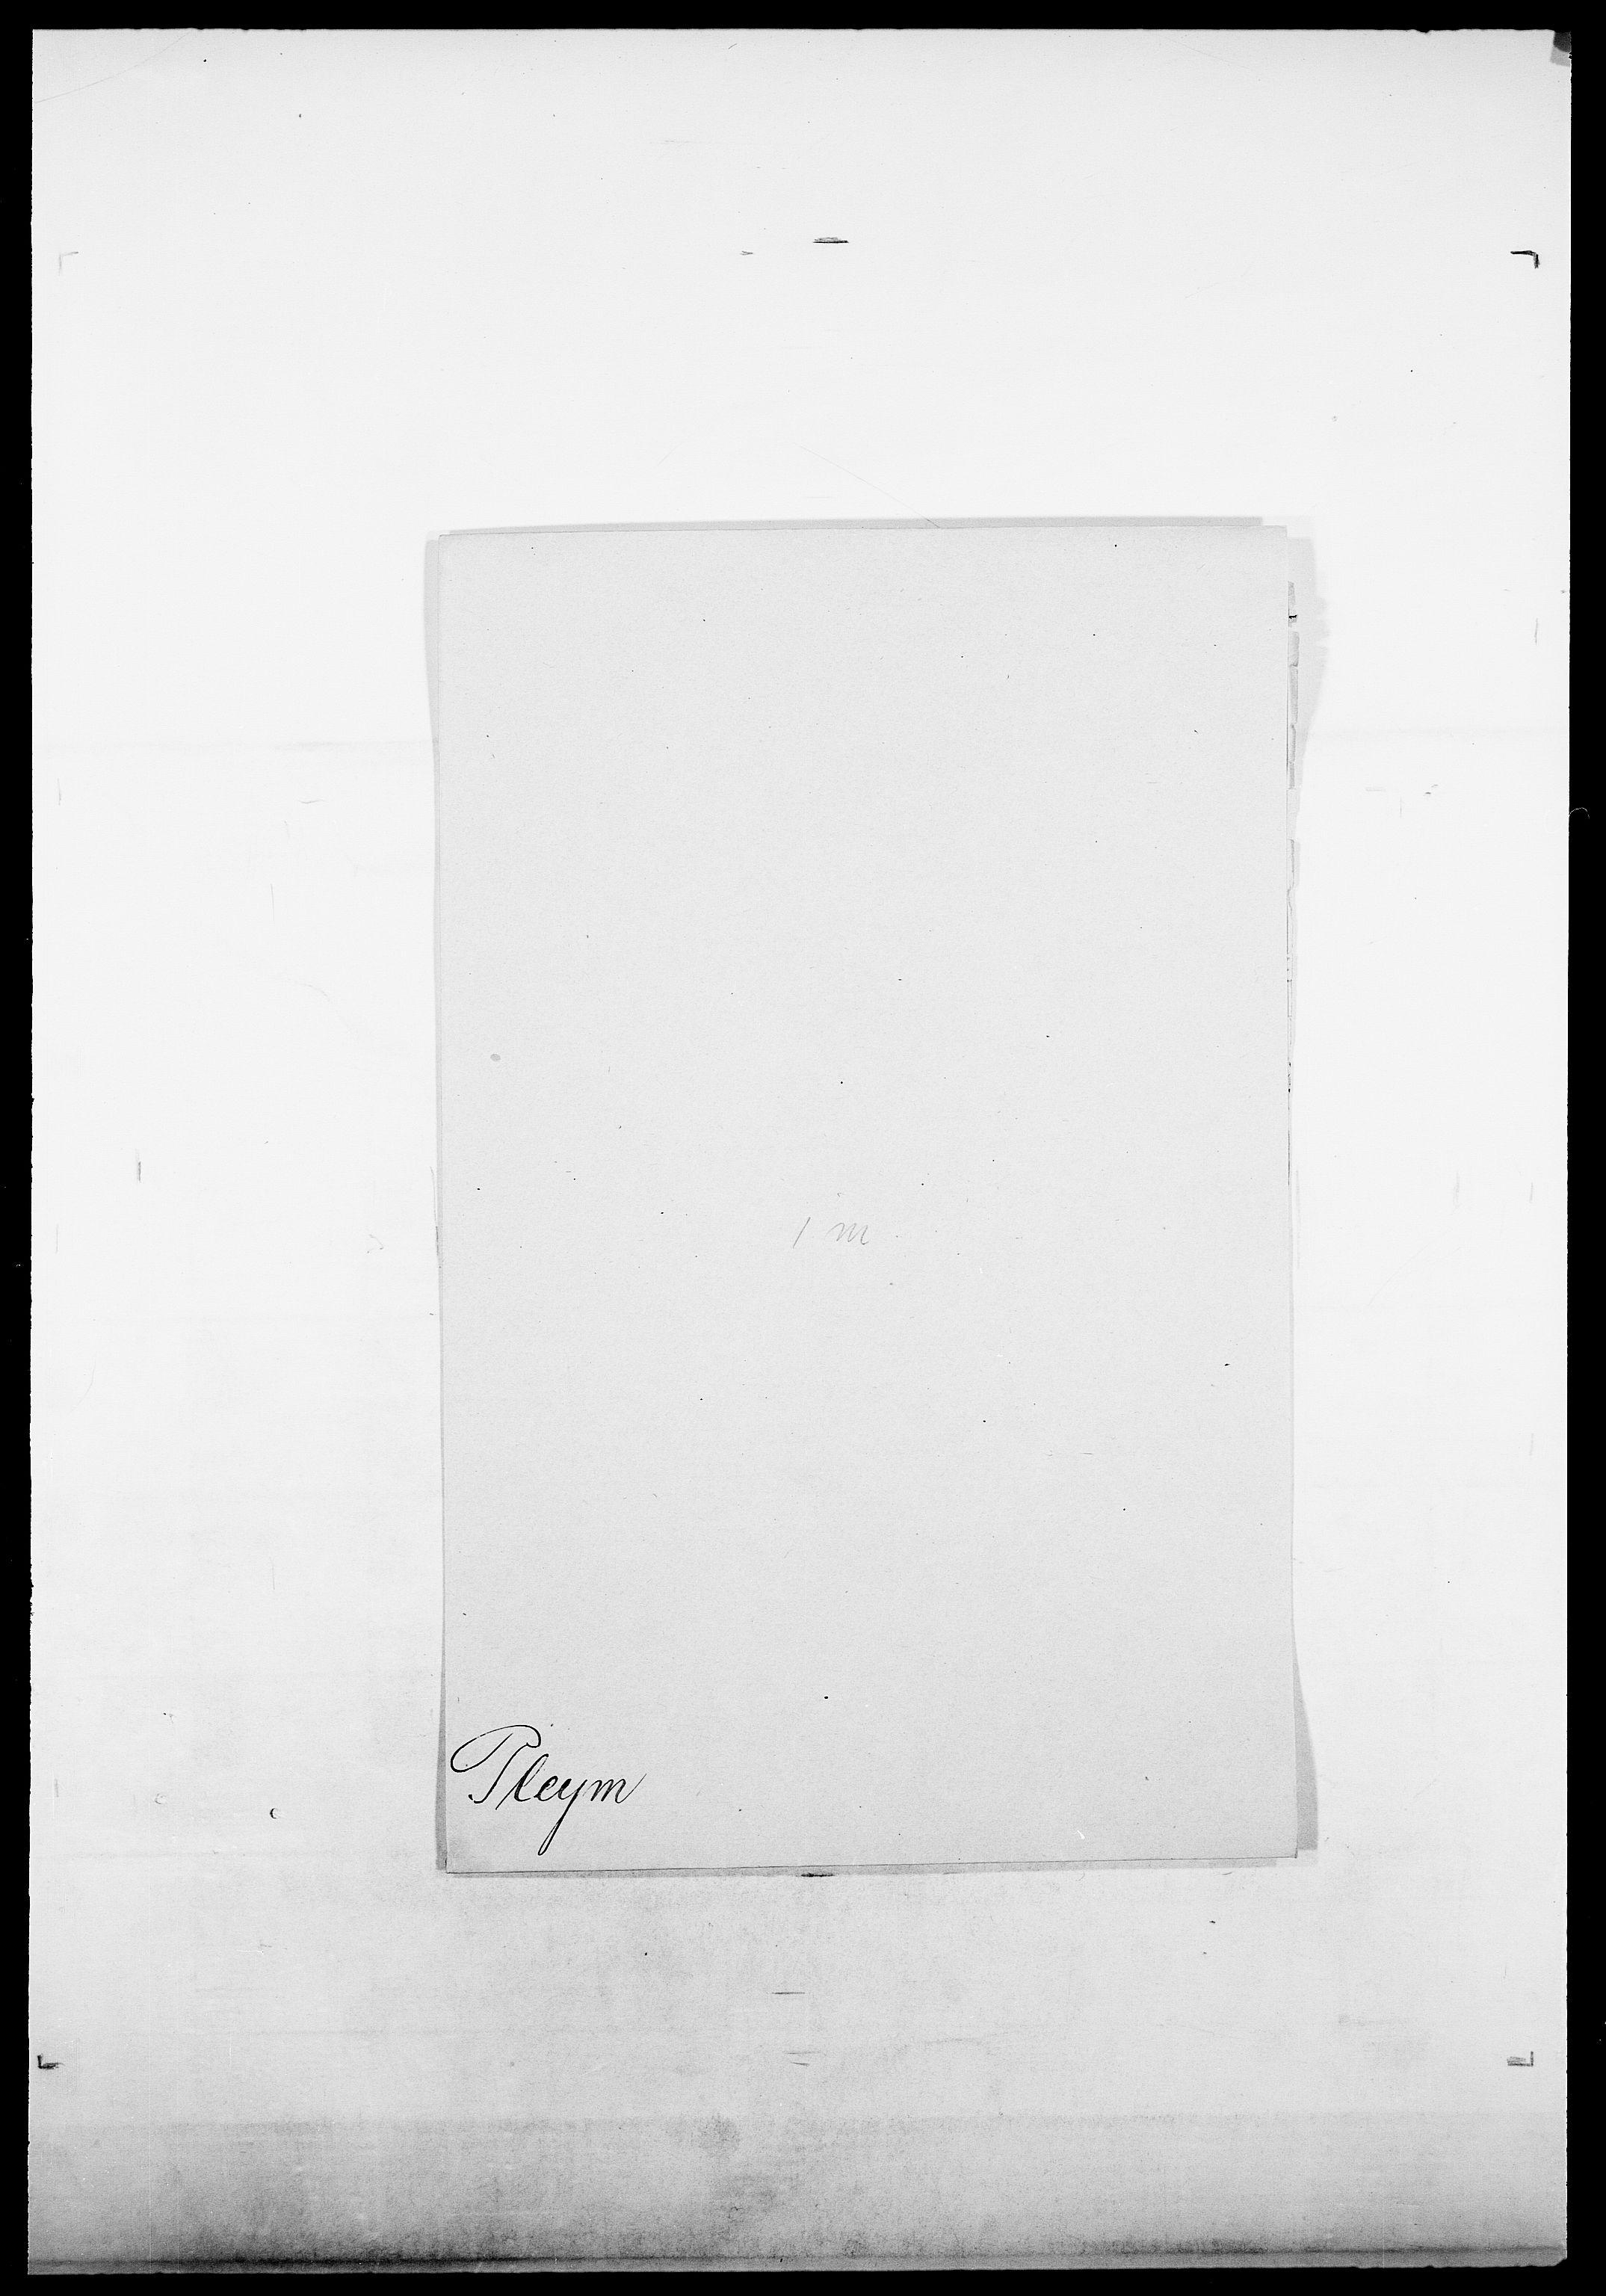 SAO, Delgobe, Charles Antoine - samling, D/Da/L0031: de Place - Raaum, s. 125